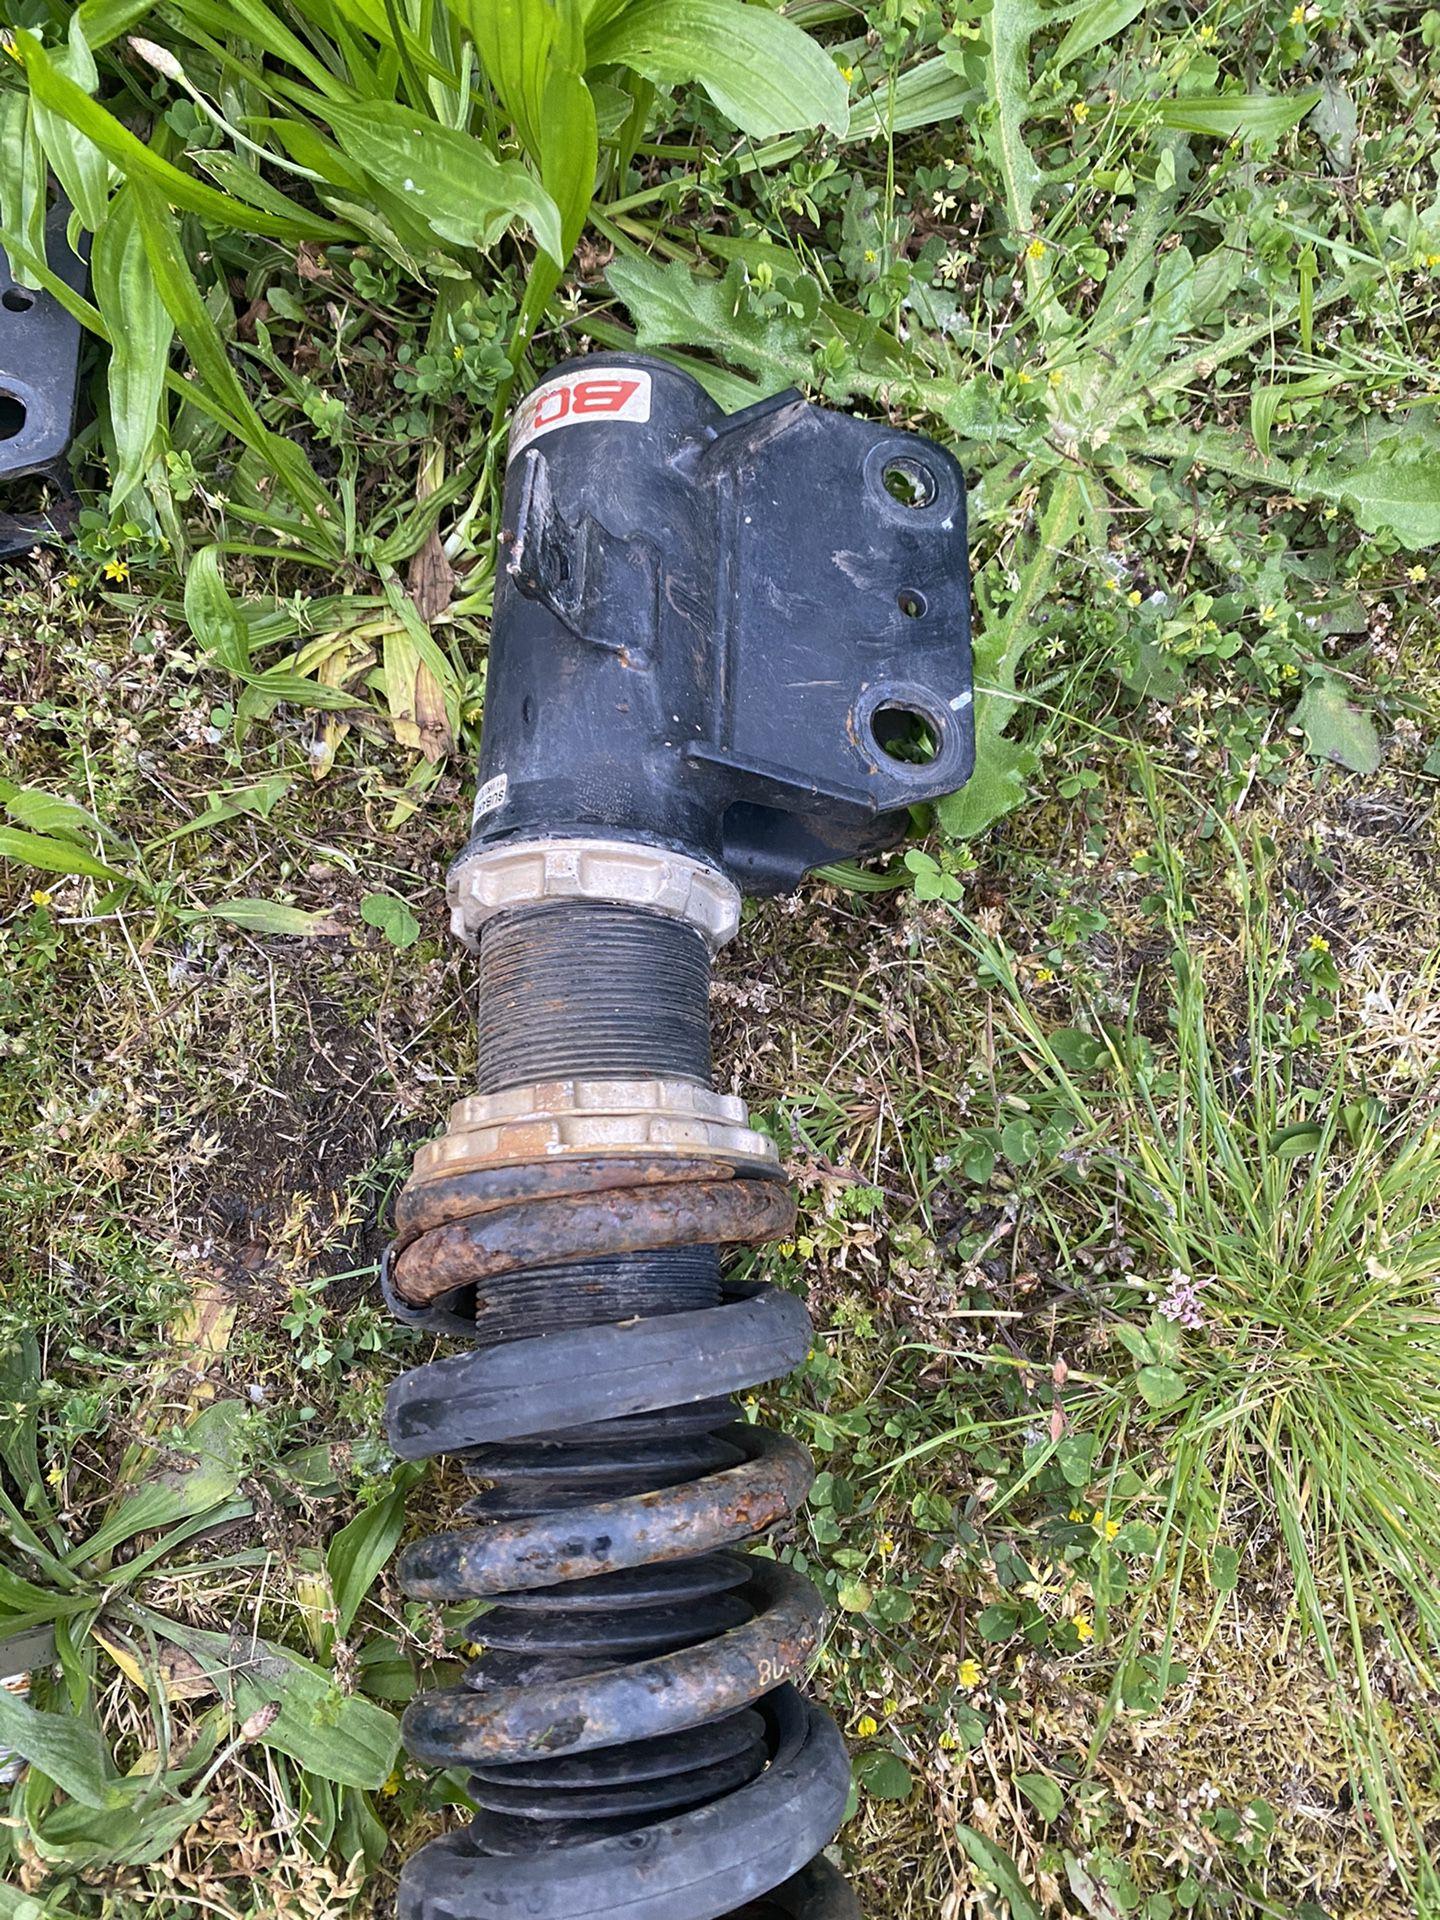 Subaru wrx coil lowers